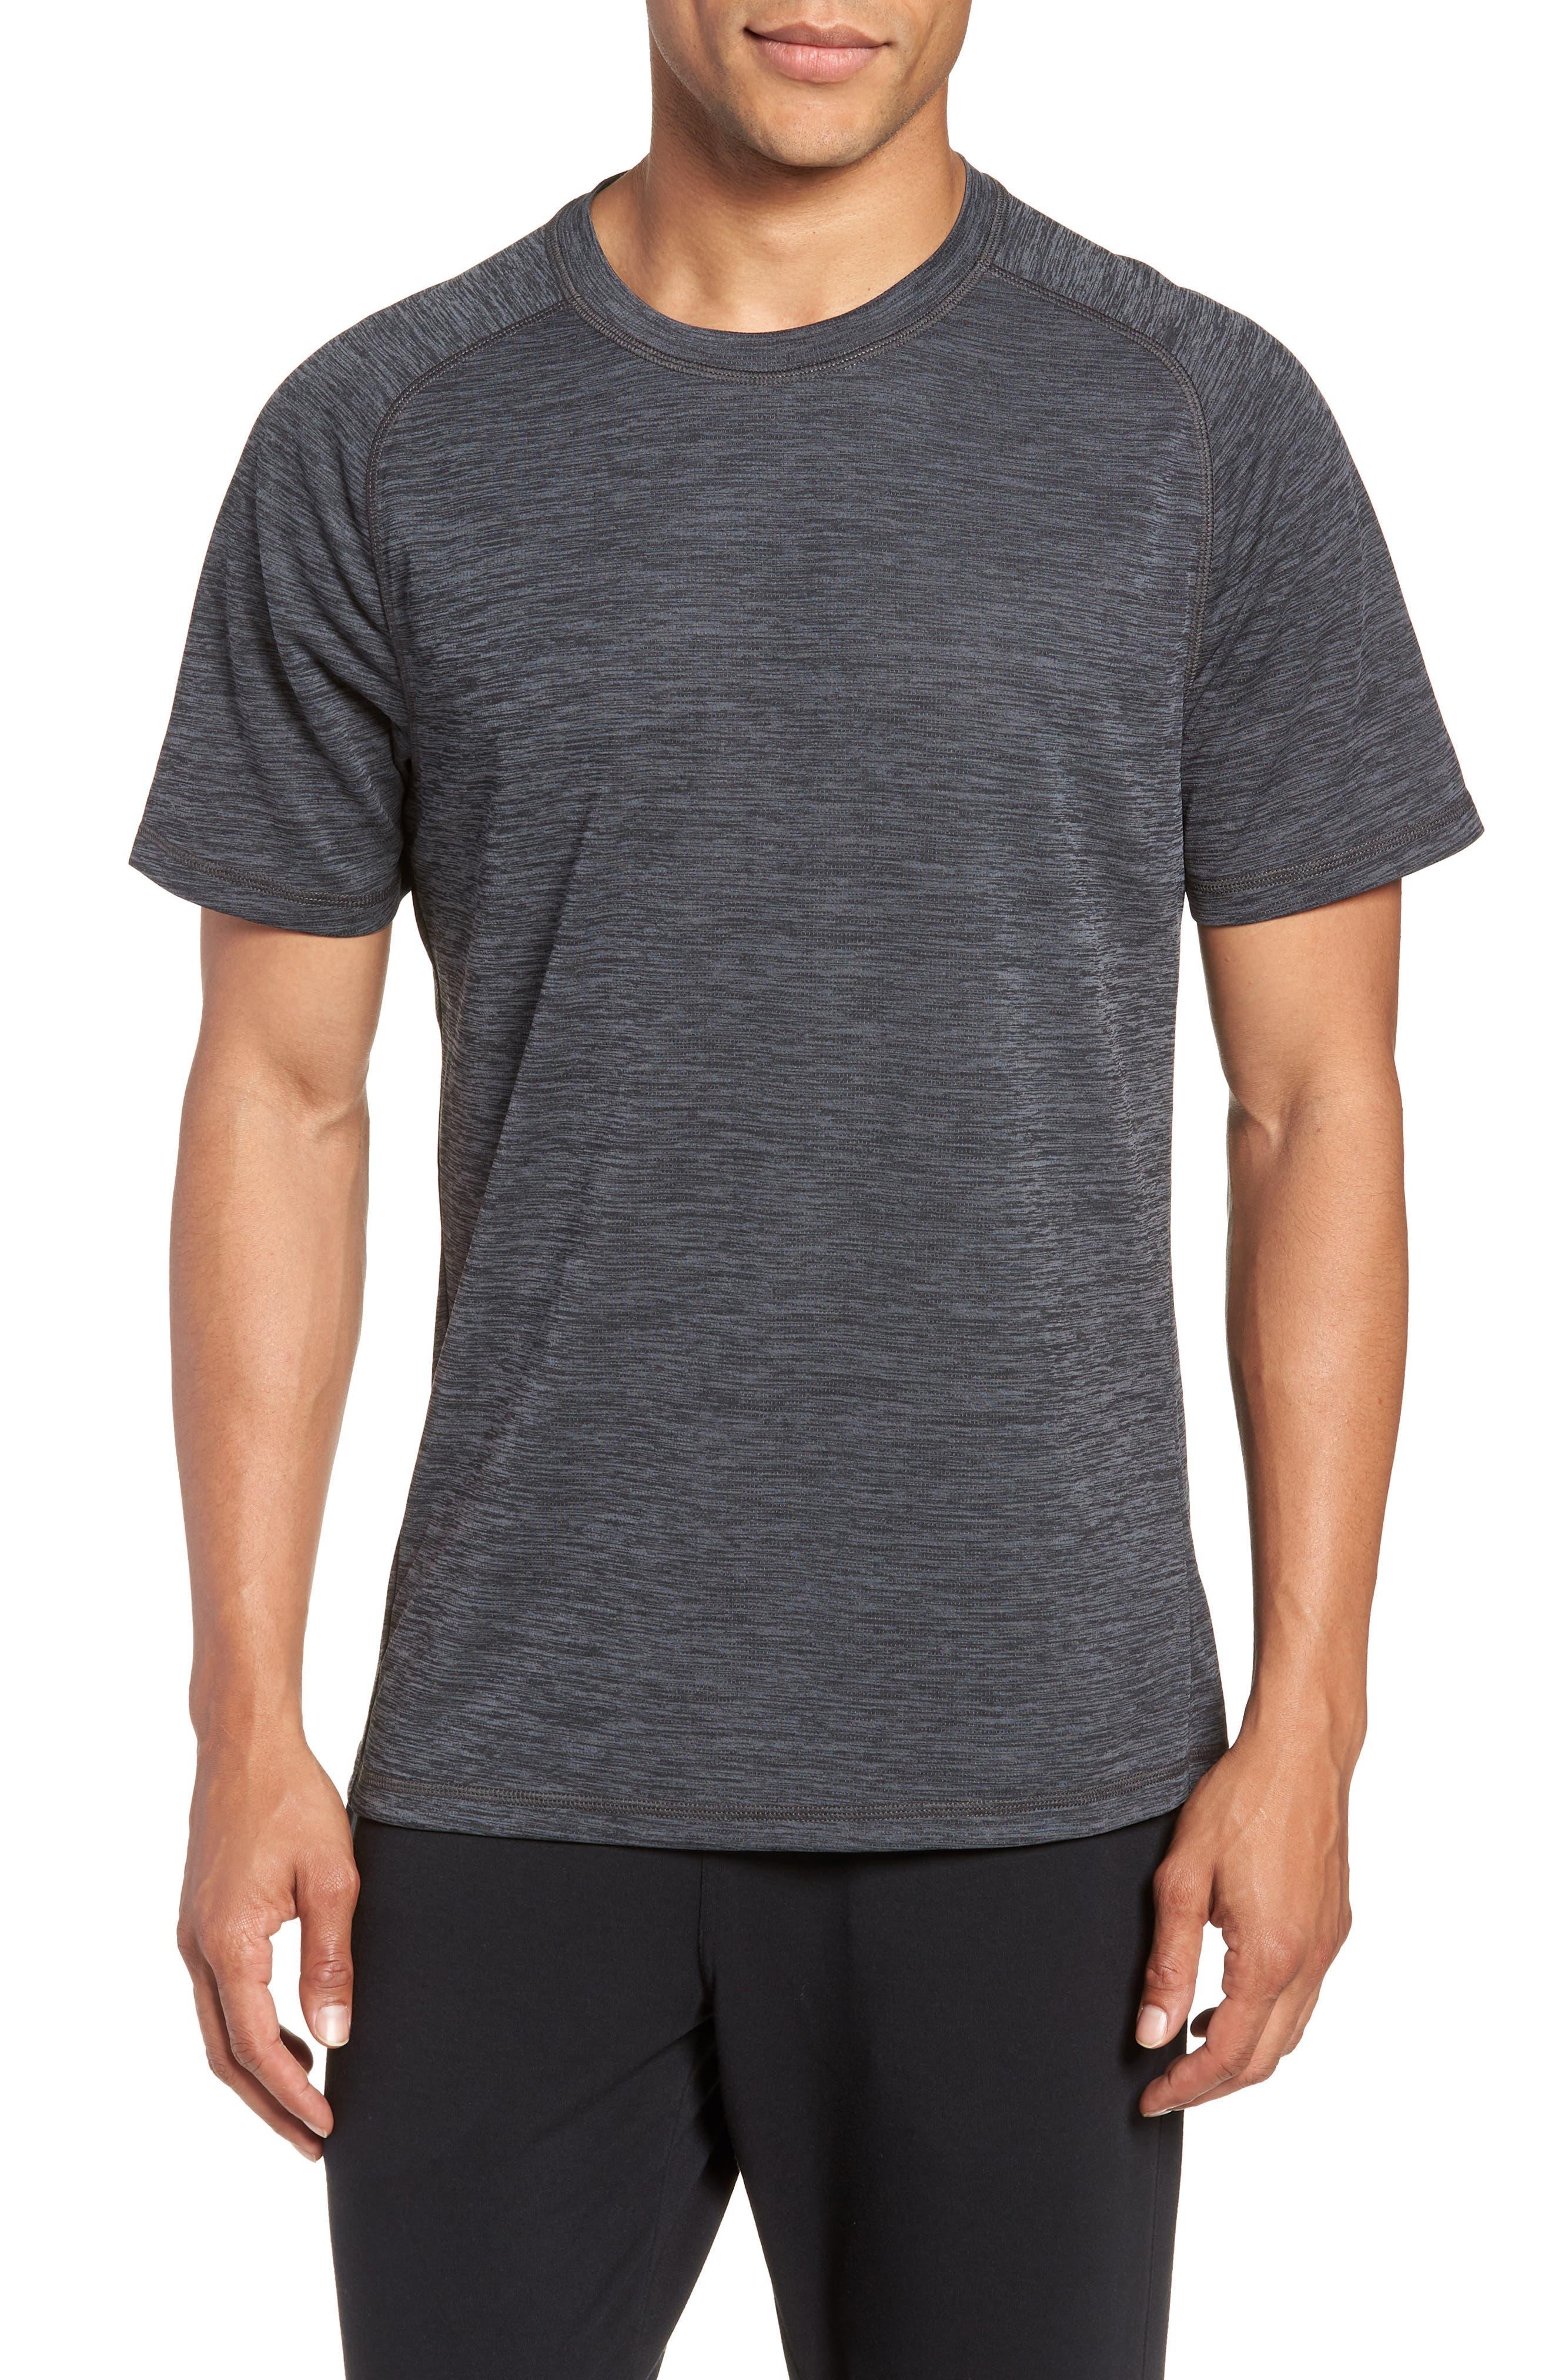 Kinoite Raglan Crewneck T-Shirt,                         Main,                         color, GREY OBSIDIAN MELANGE